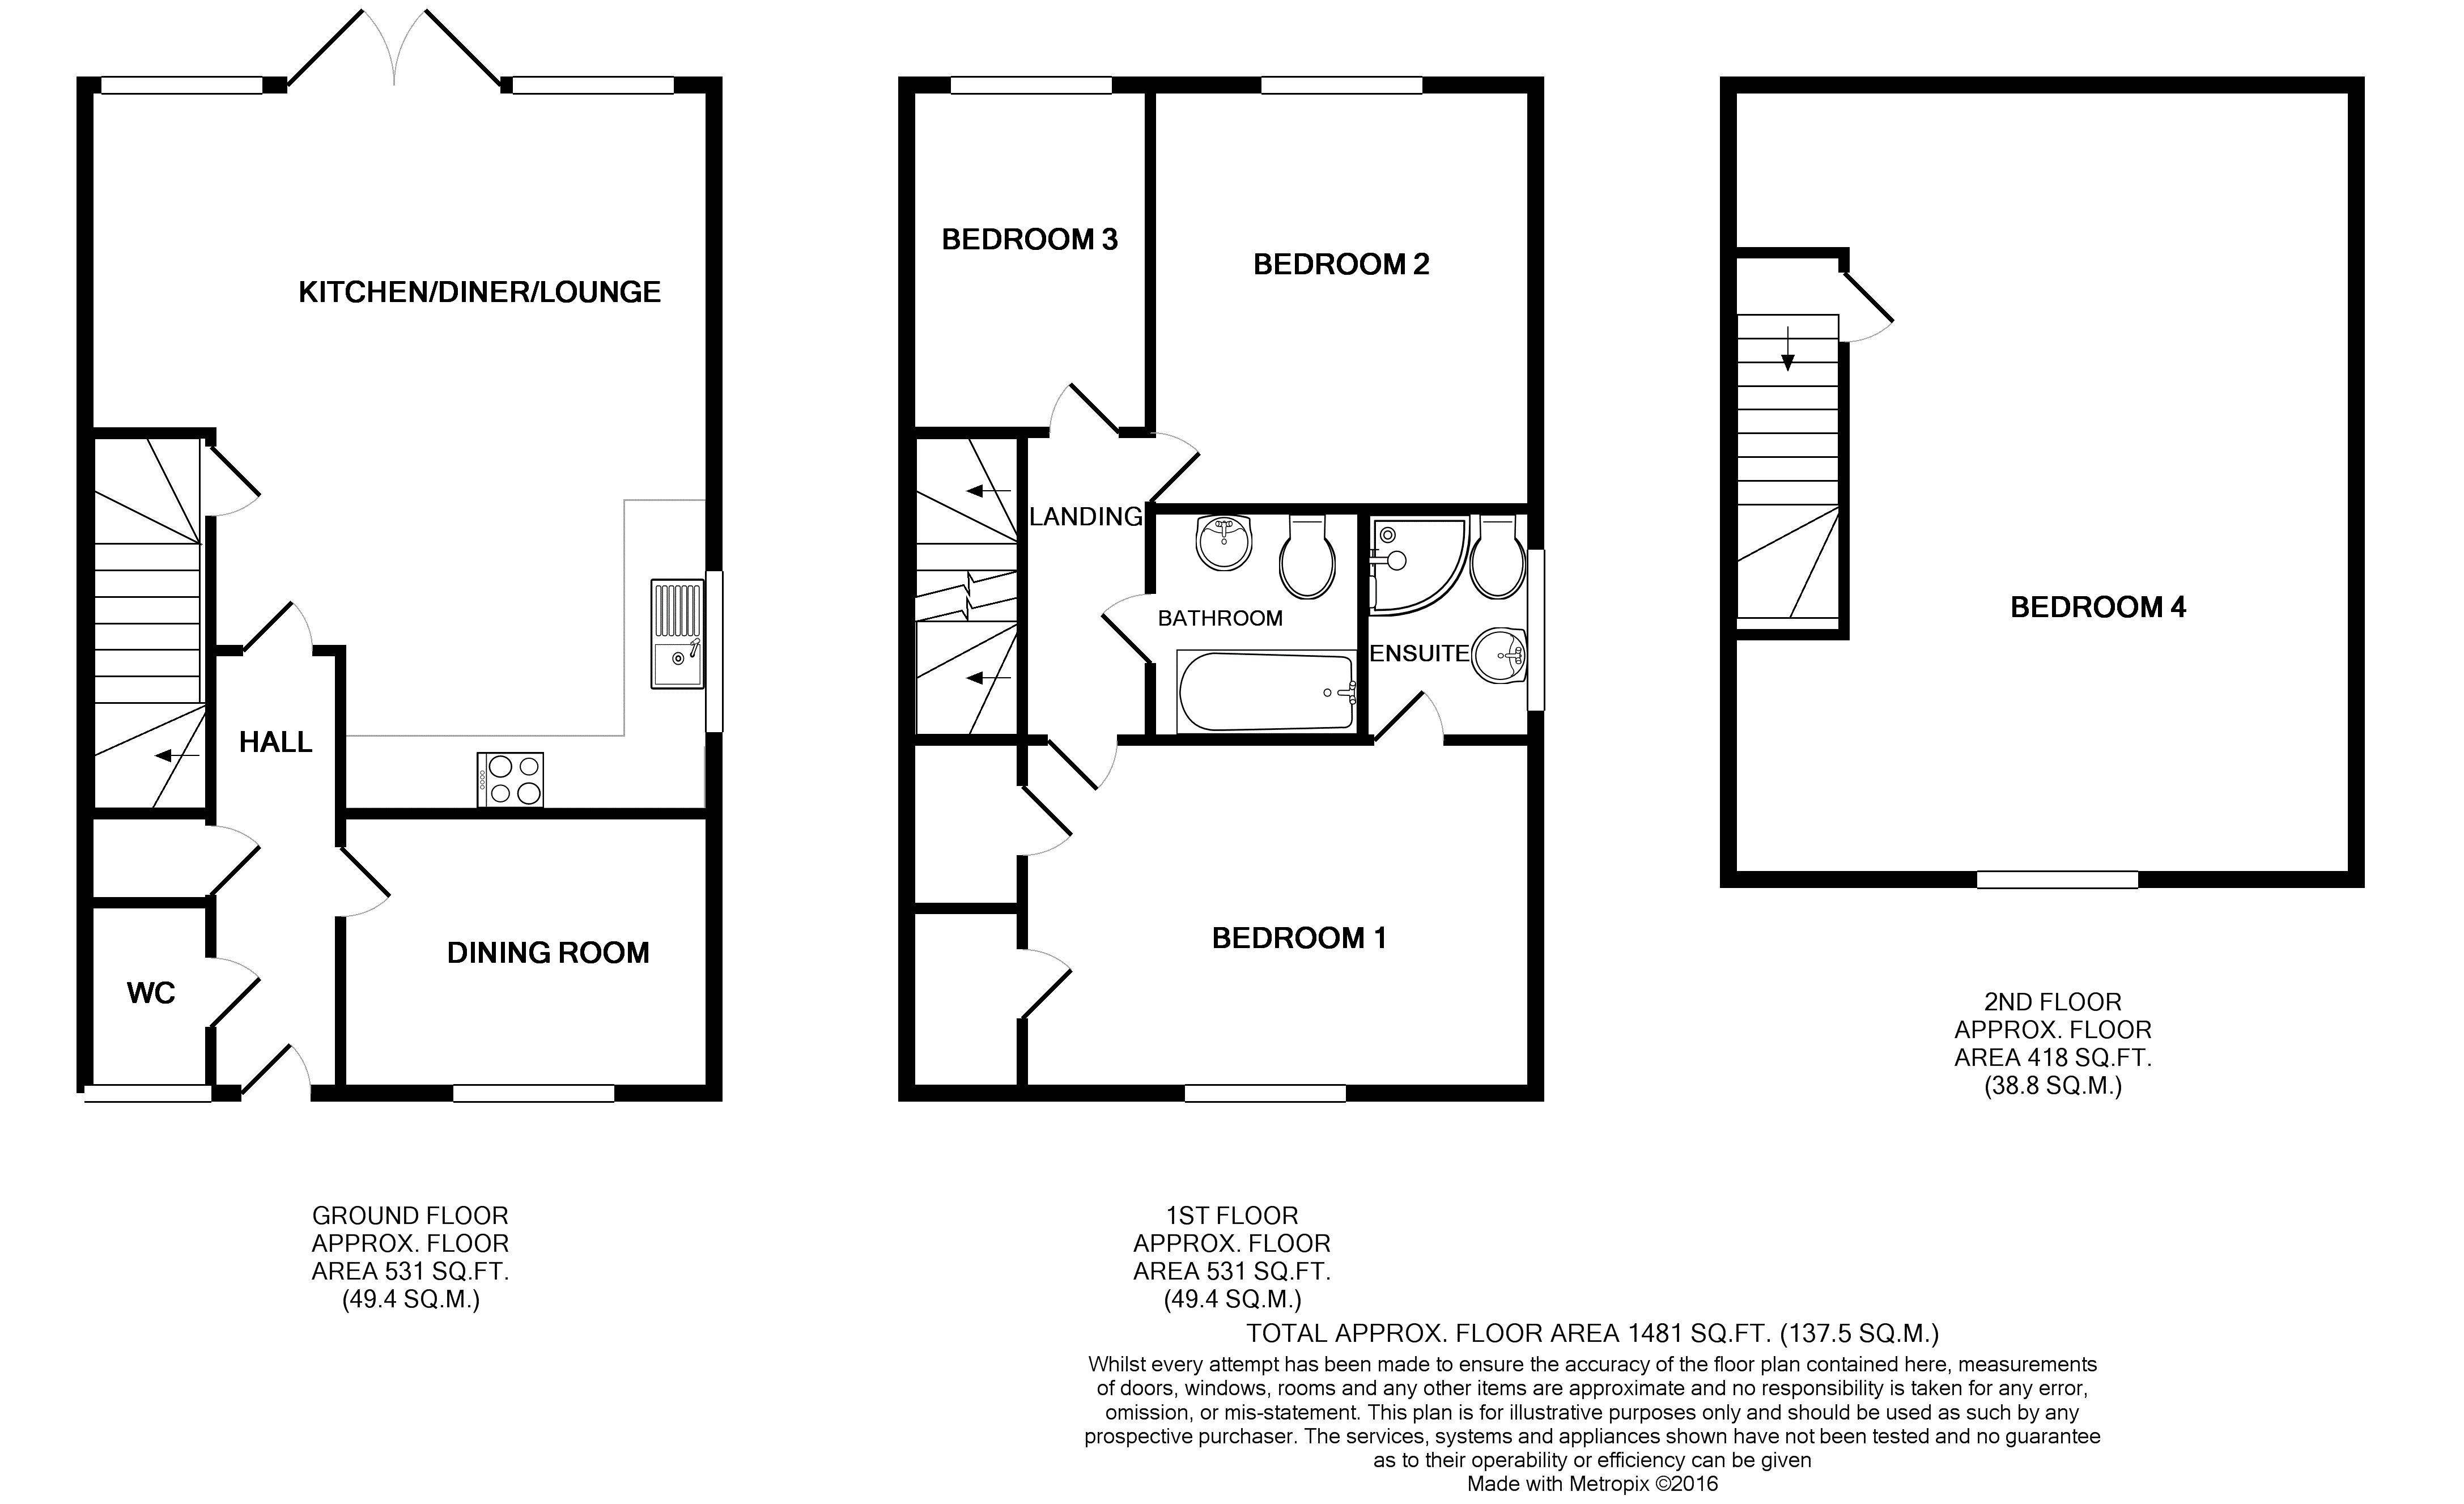 Houses 5 & 12